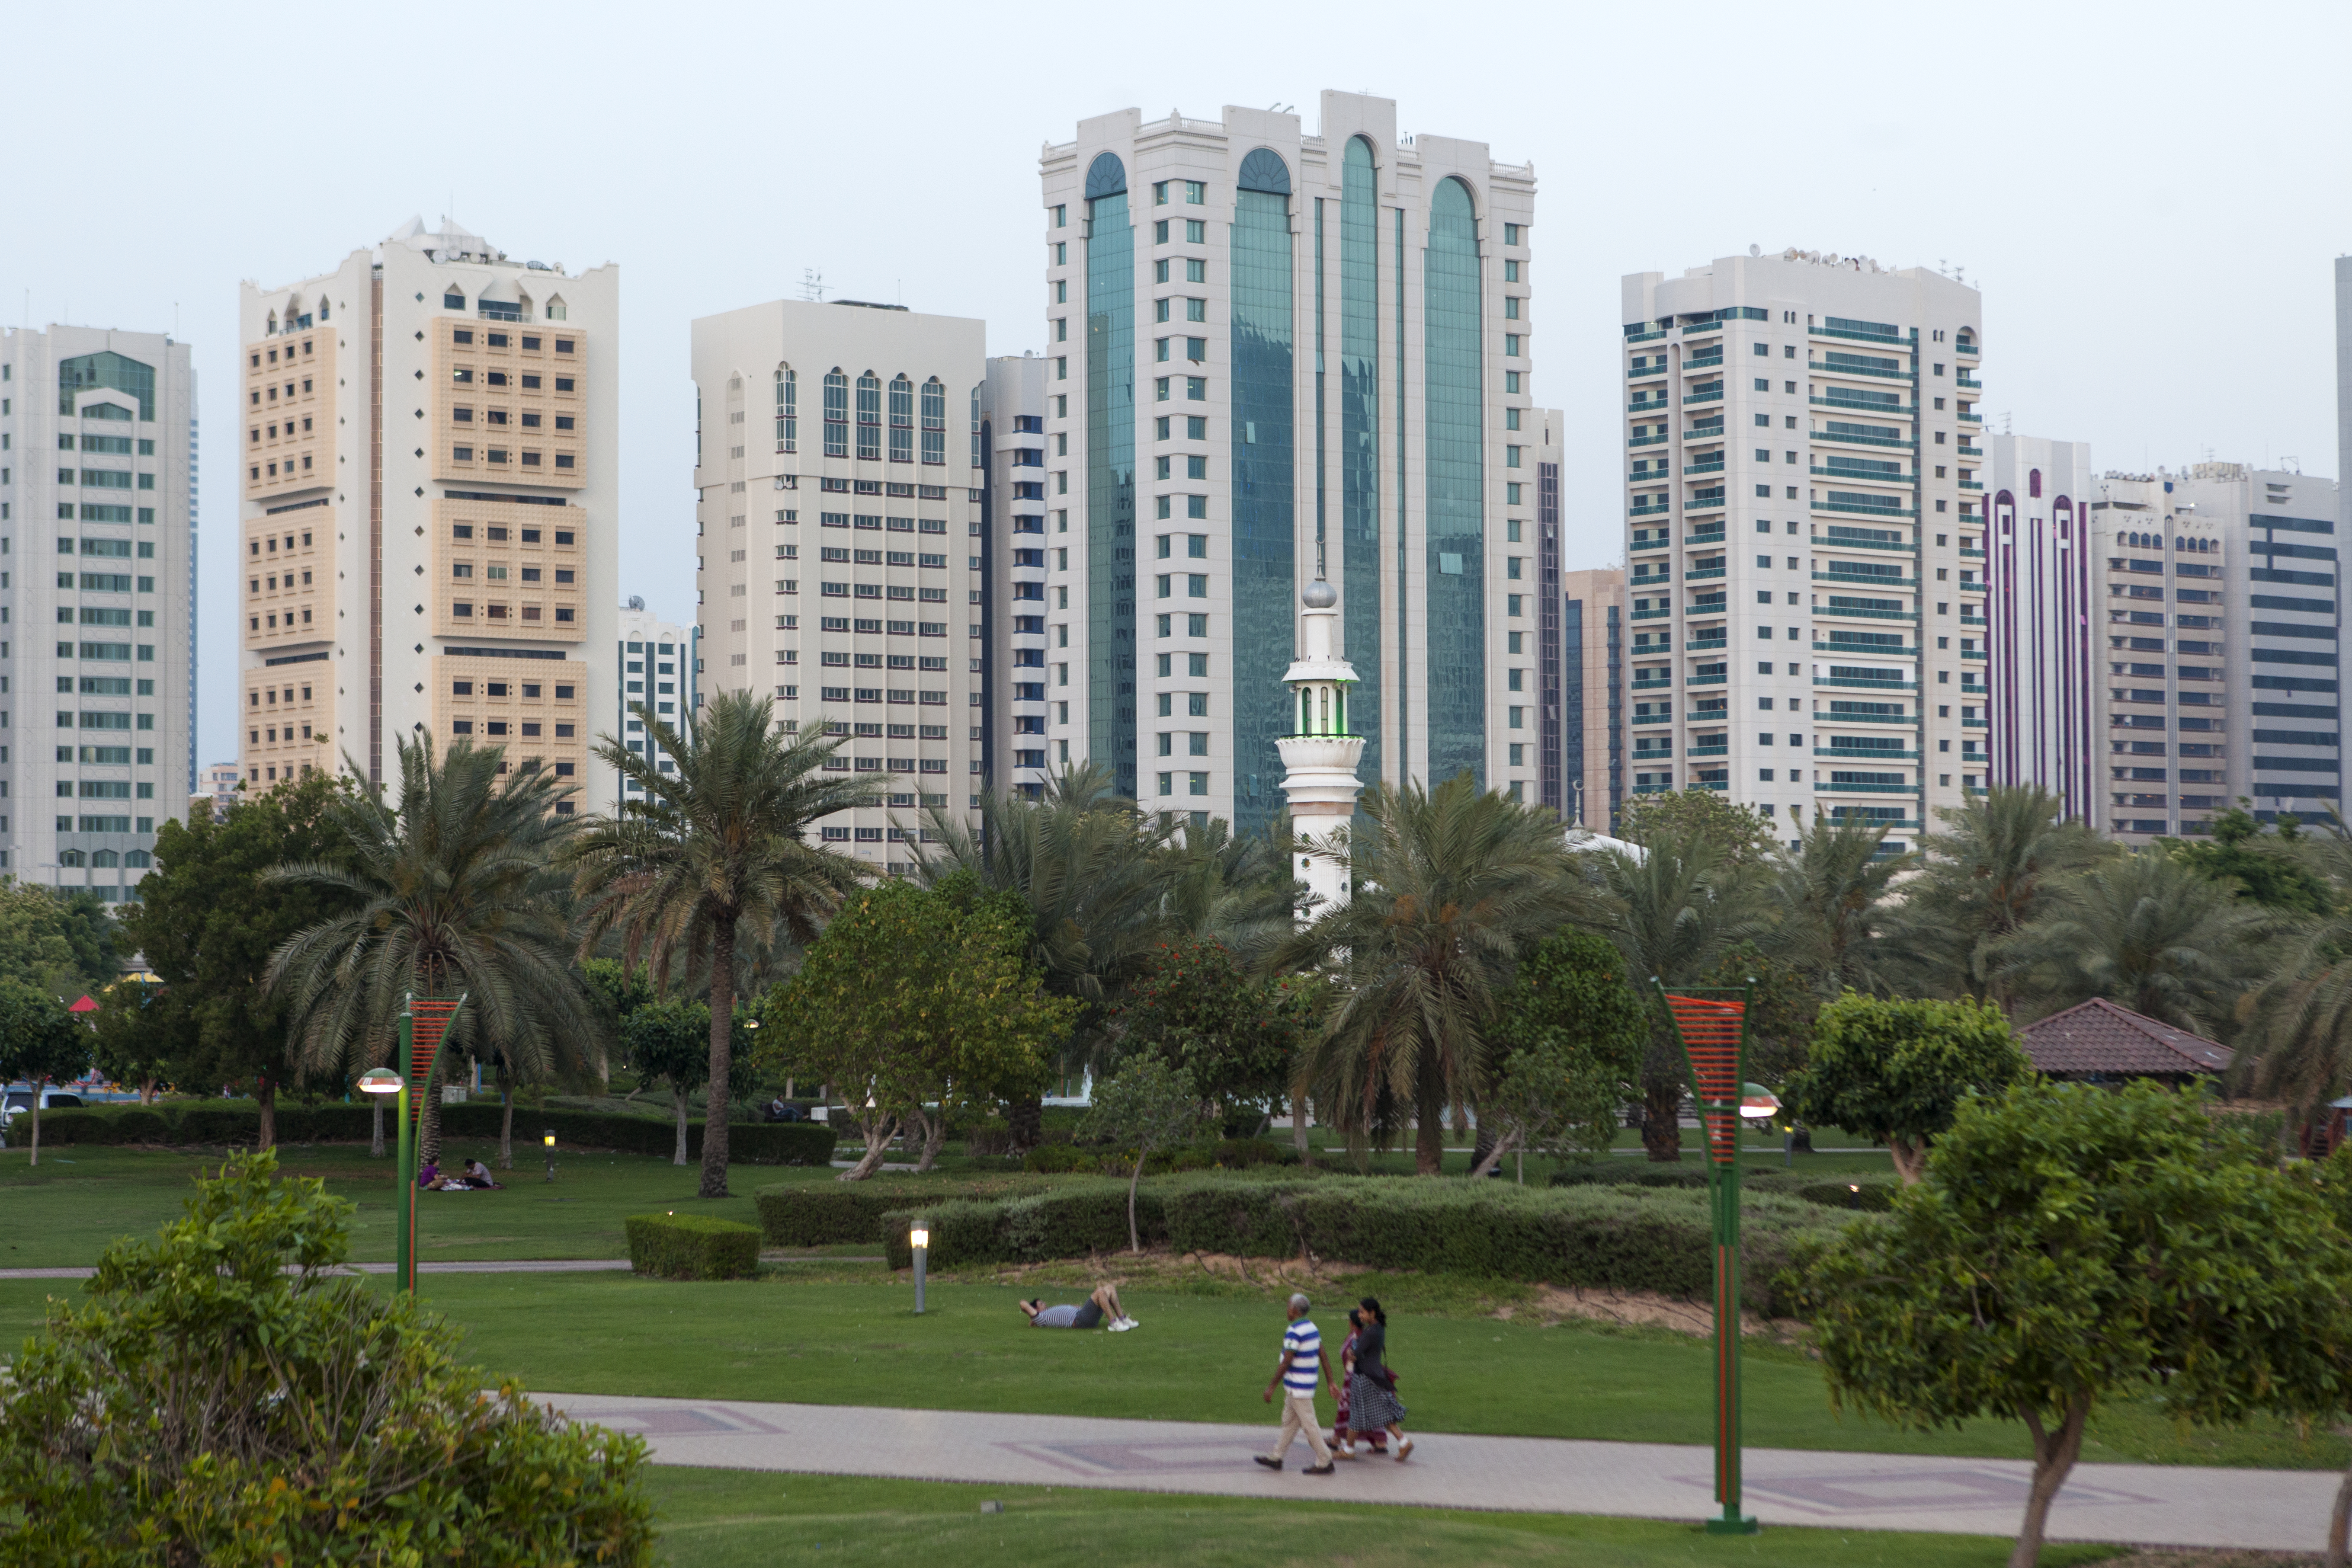 The Streets of Abu Dhabi